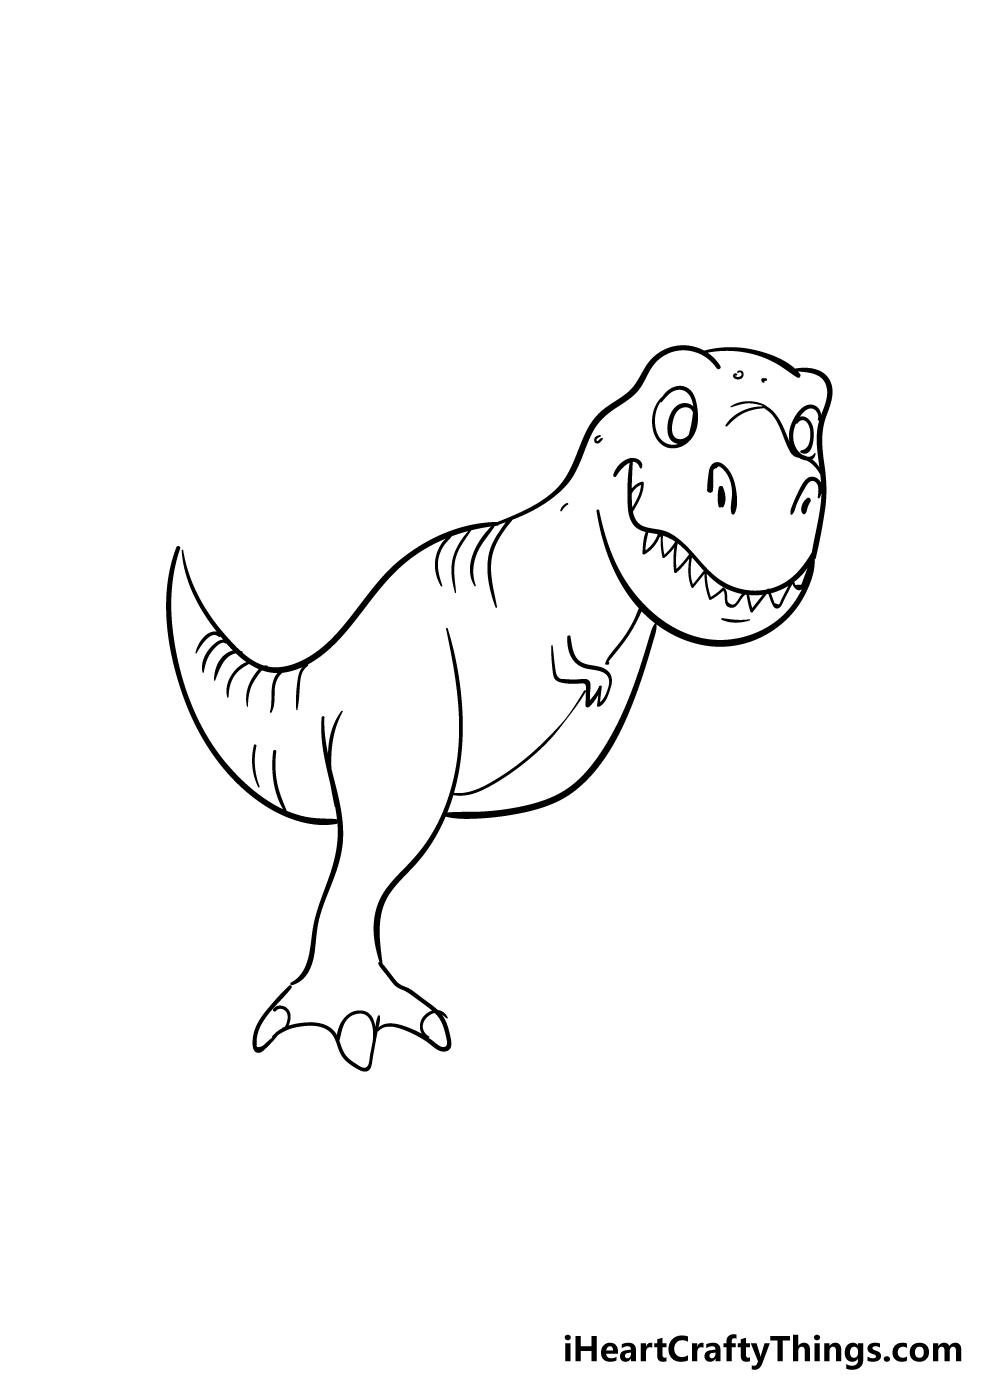 t-rex drawing step 6